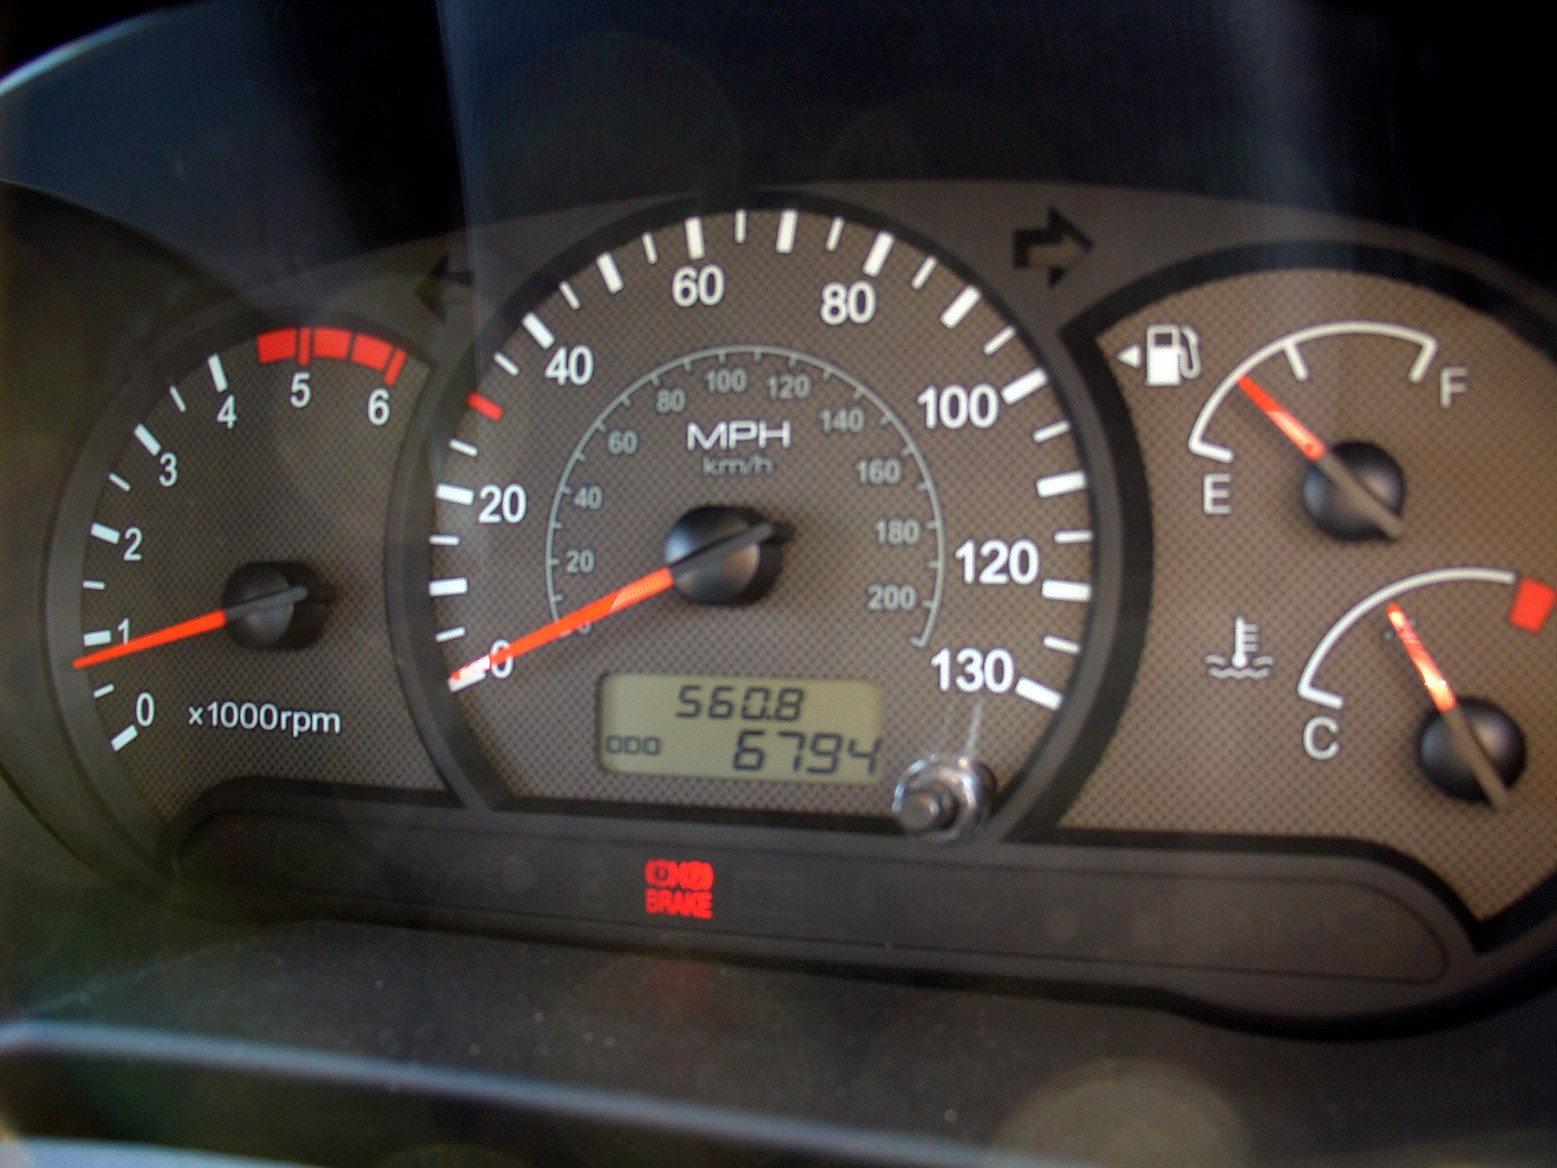 Dsc on 2000 Hyundai Accent